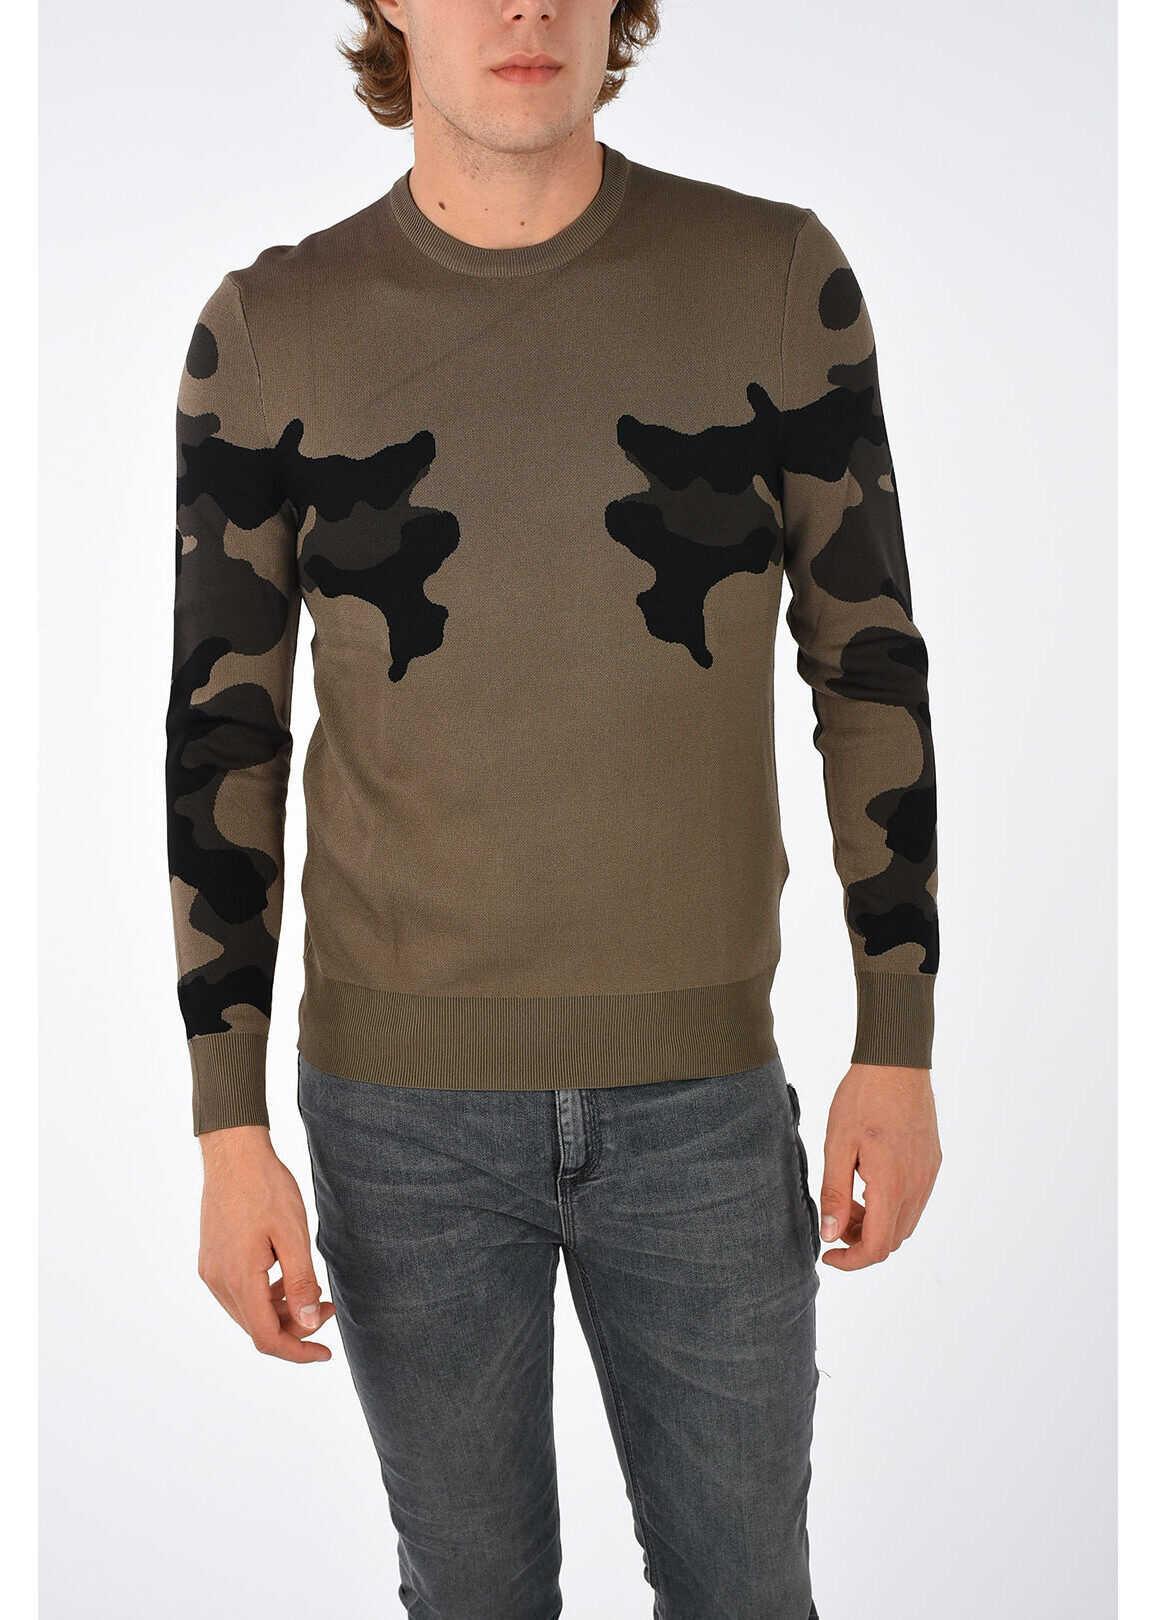 Neil Barrett Camouflage Crewneck Sweater BROWN